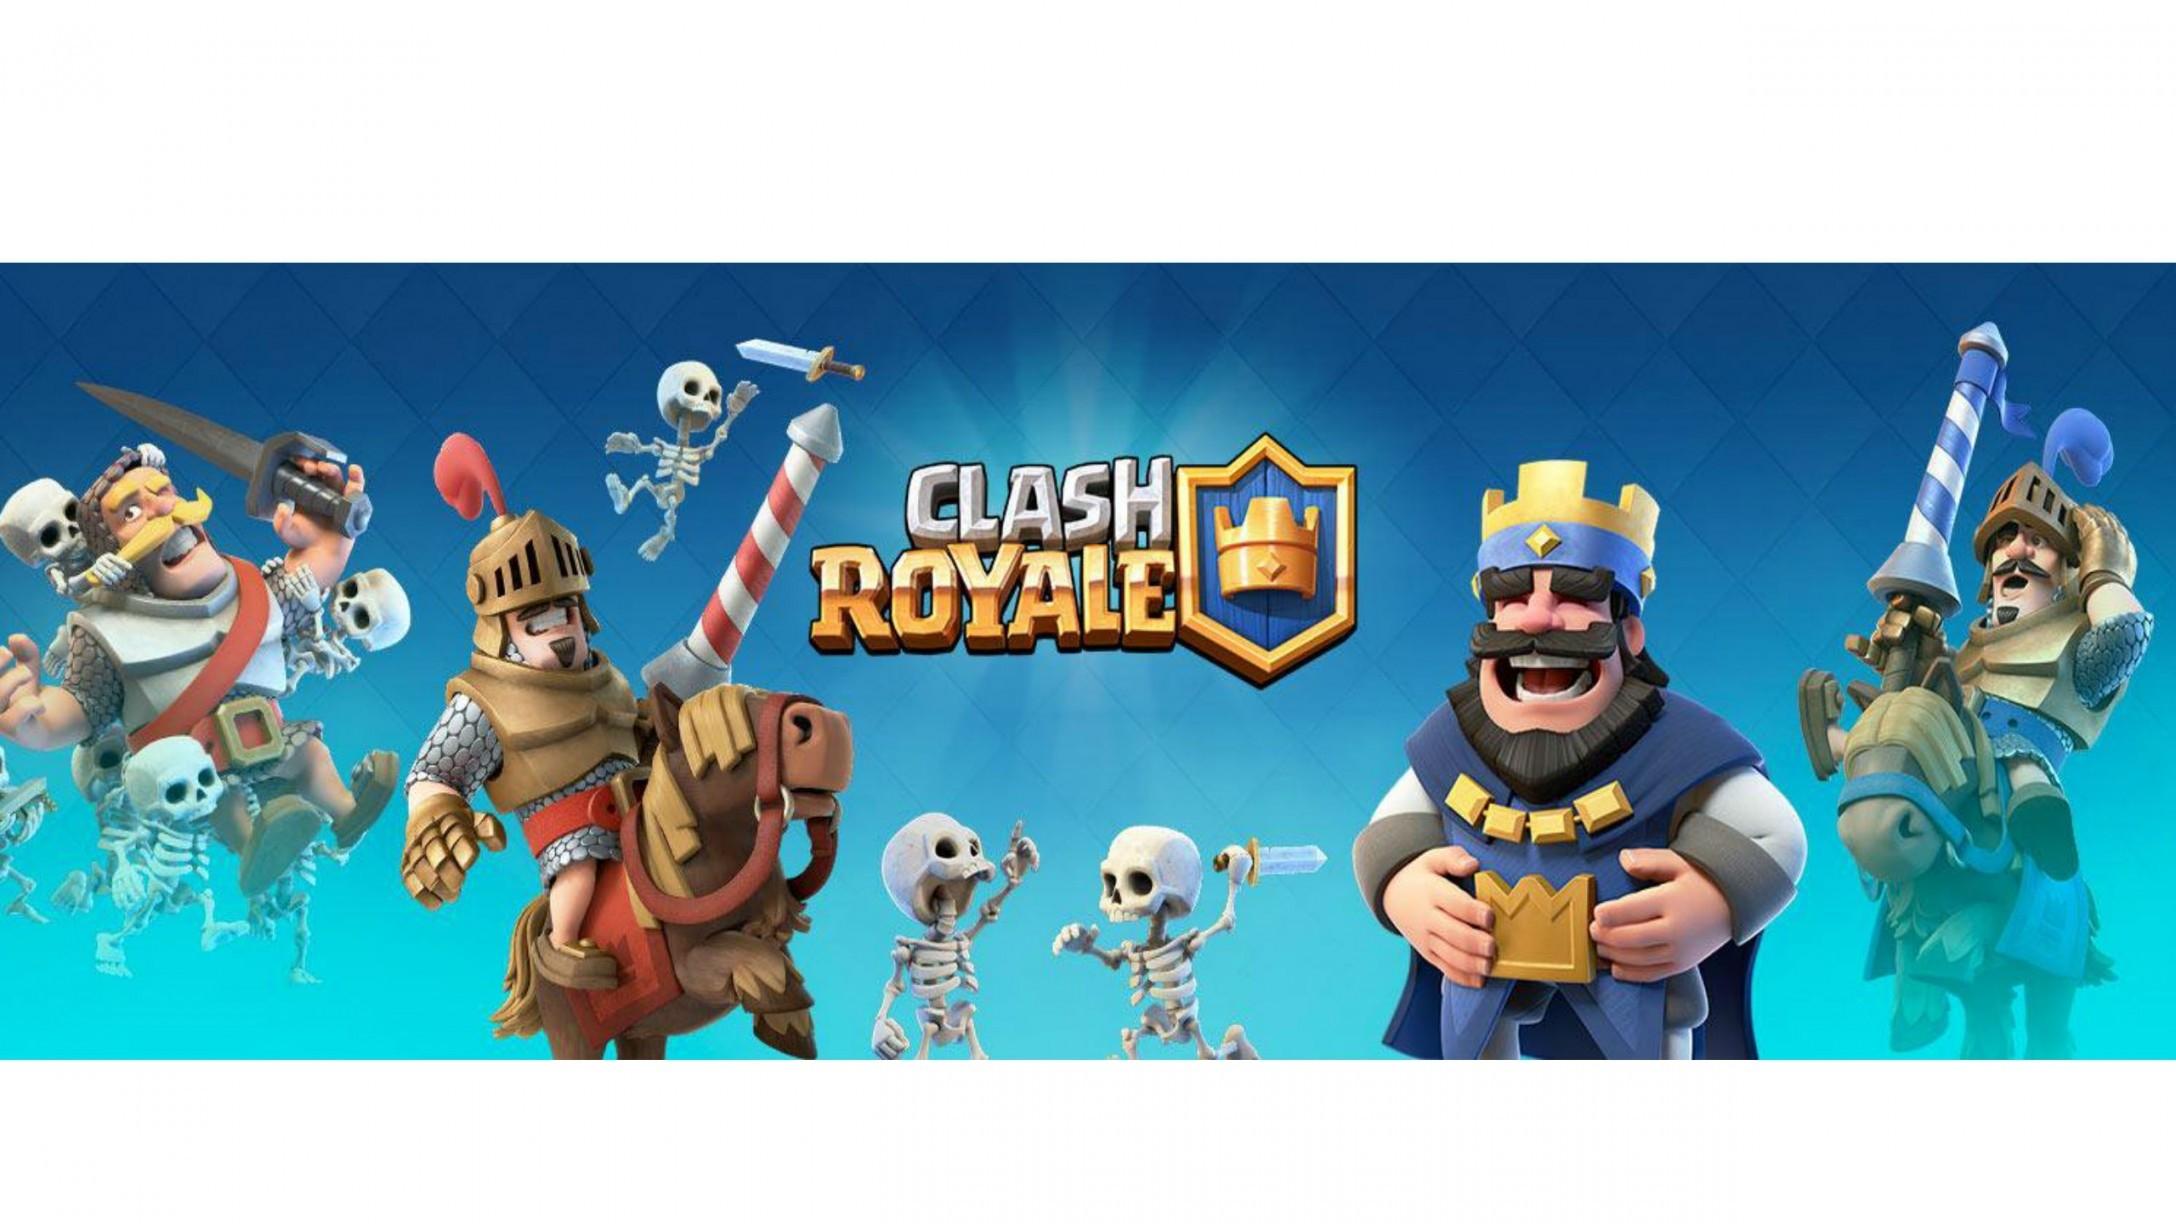 Clash royale wallpapers 80 images - Clash royale 2560x1440 ...